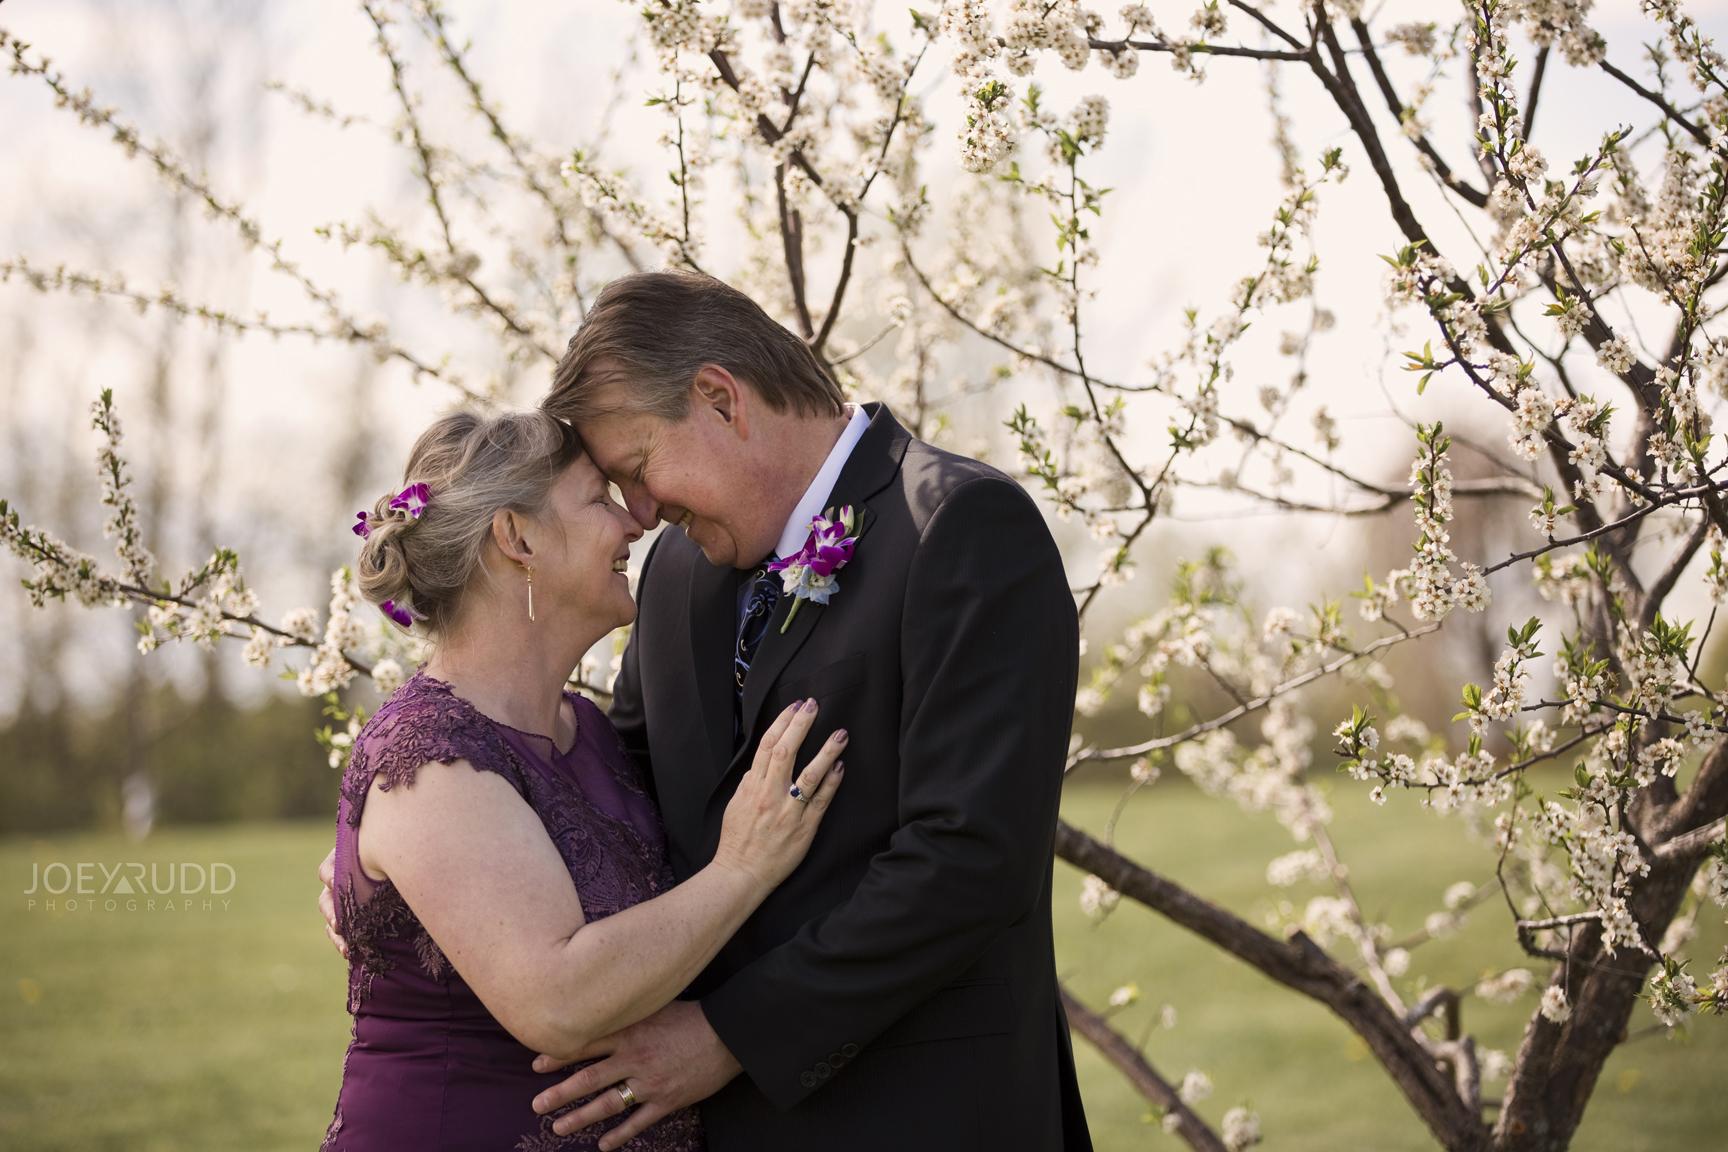 Elopement Session at Jabulani Vineyard by Joey Rudd Photography Ottawa Wedding Photographer Blossom Tree